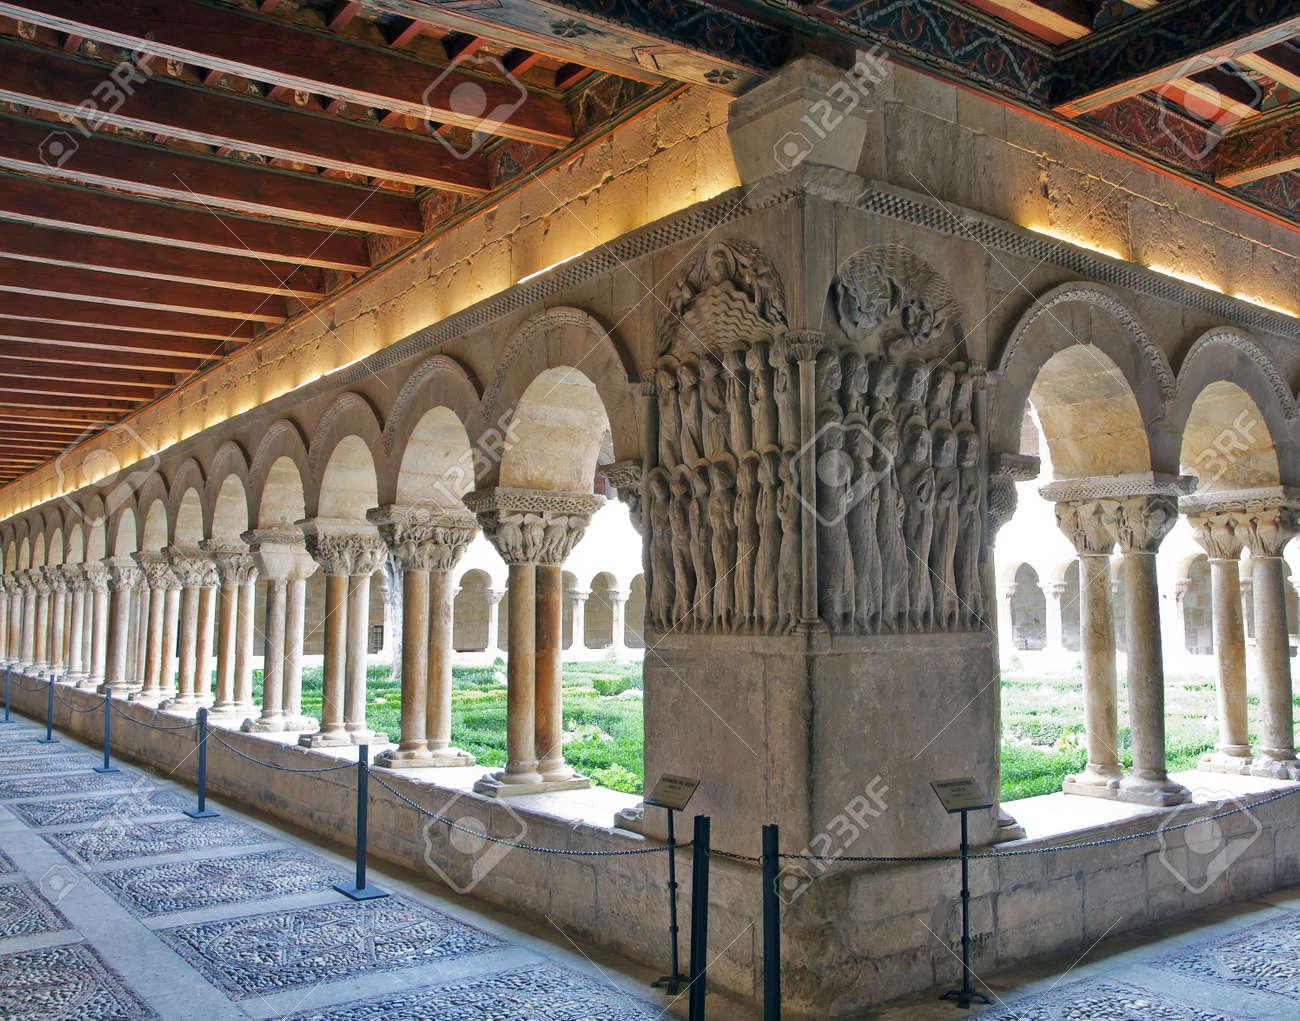 Cloister of Monasterio de Santo Domingo de Silos, Burgos, Spain - 16485293